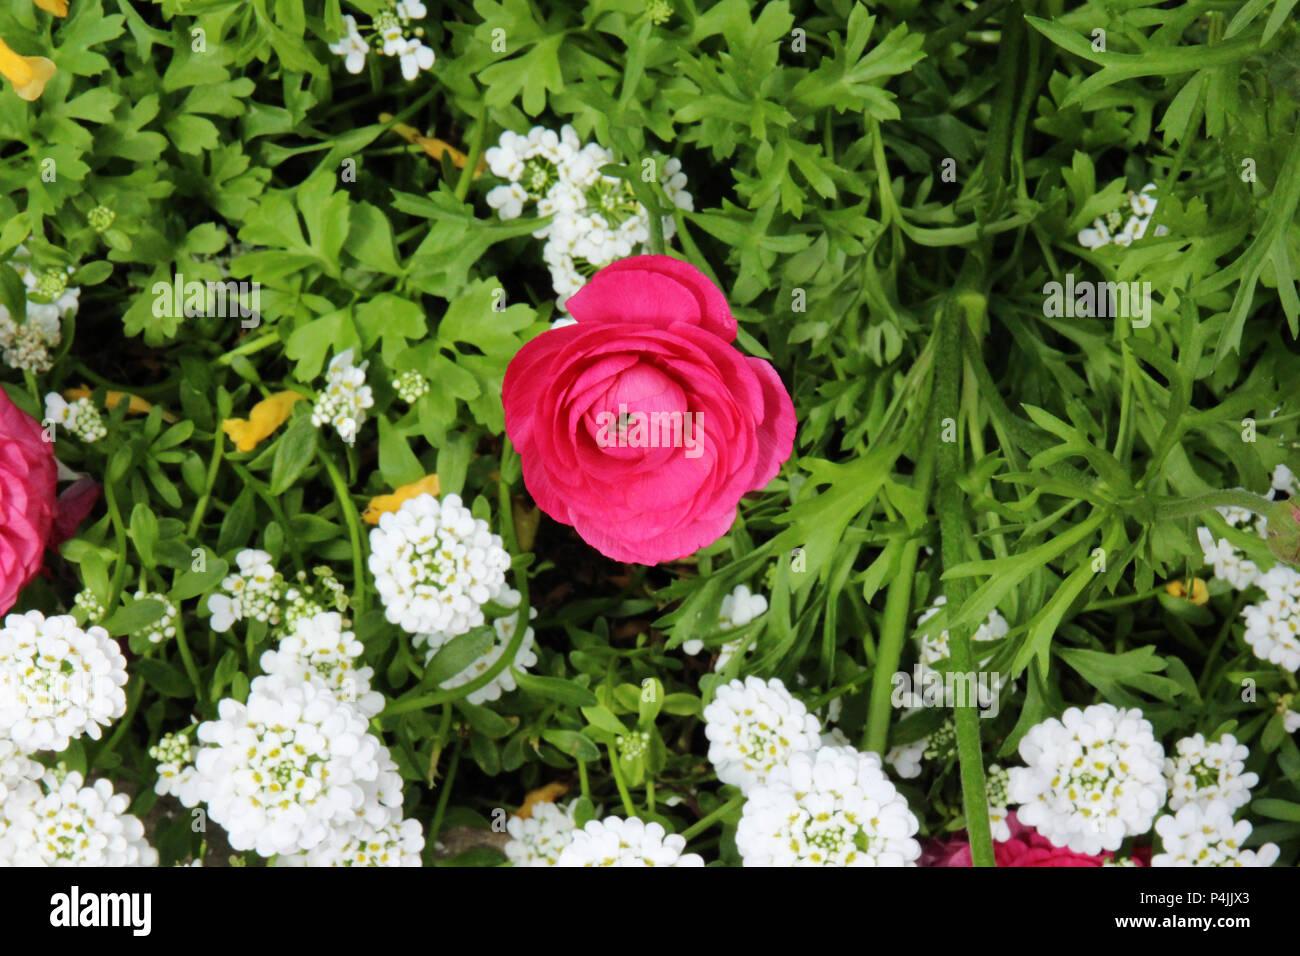 Close up of a pink ranunculus flower beginning to bloom growing close up of a pink ranunculus flower beginning to bloom growing amidst white candytuft flowers mightylinksfo